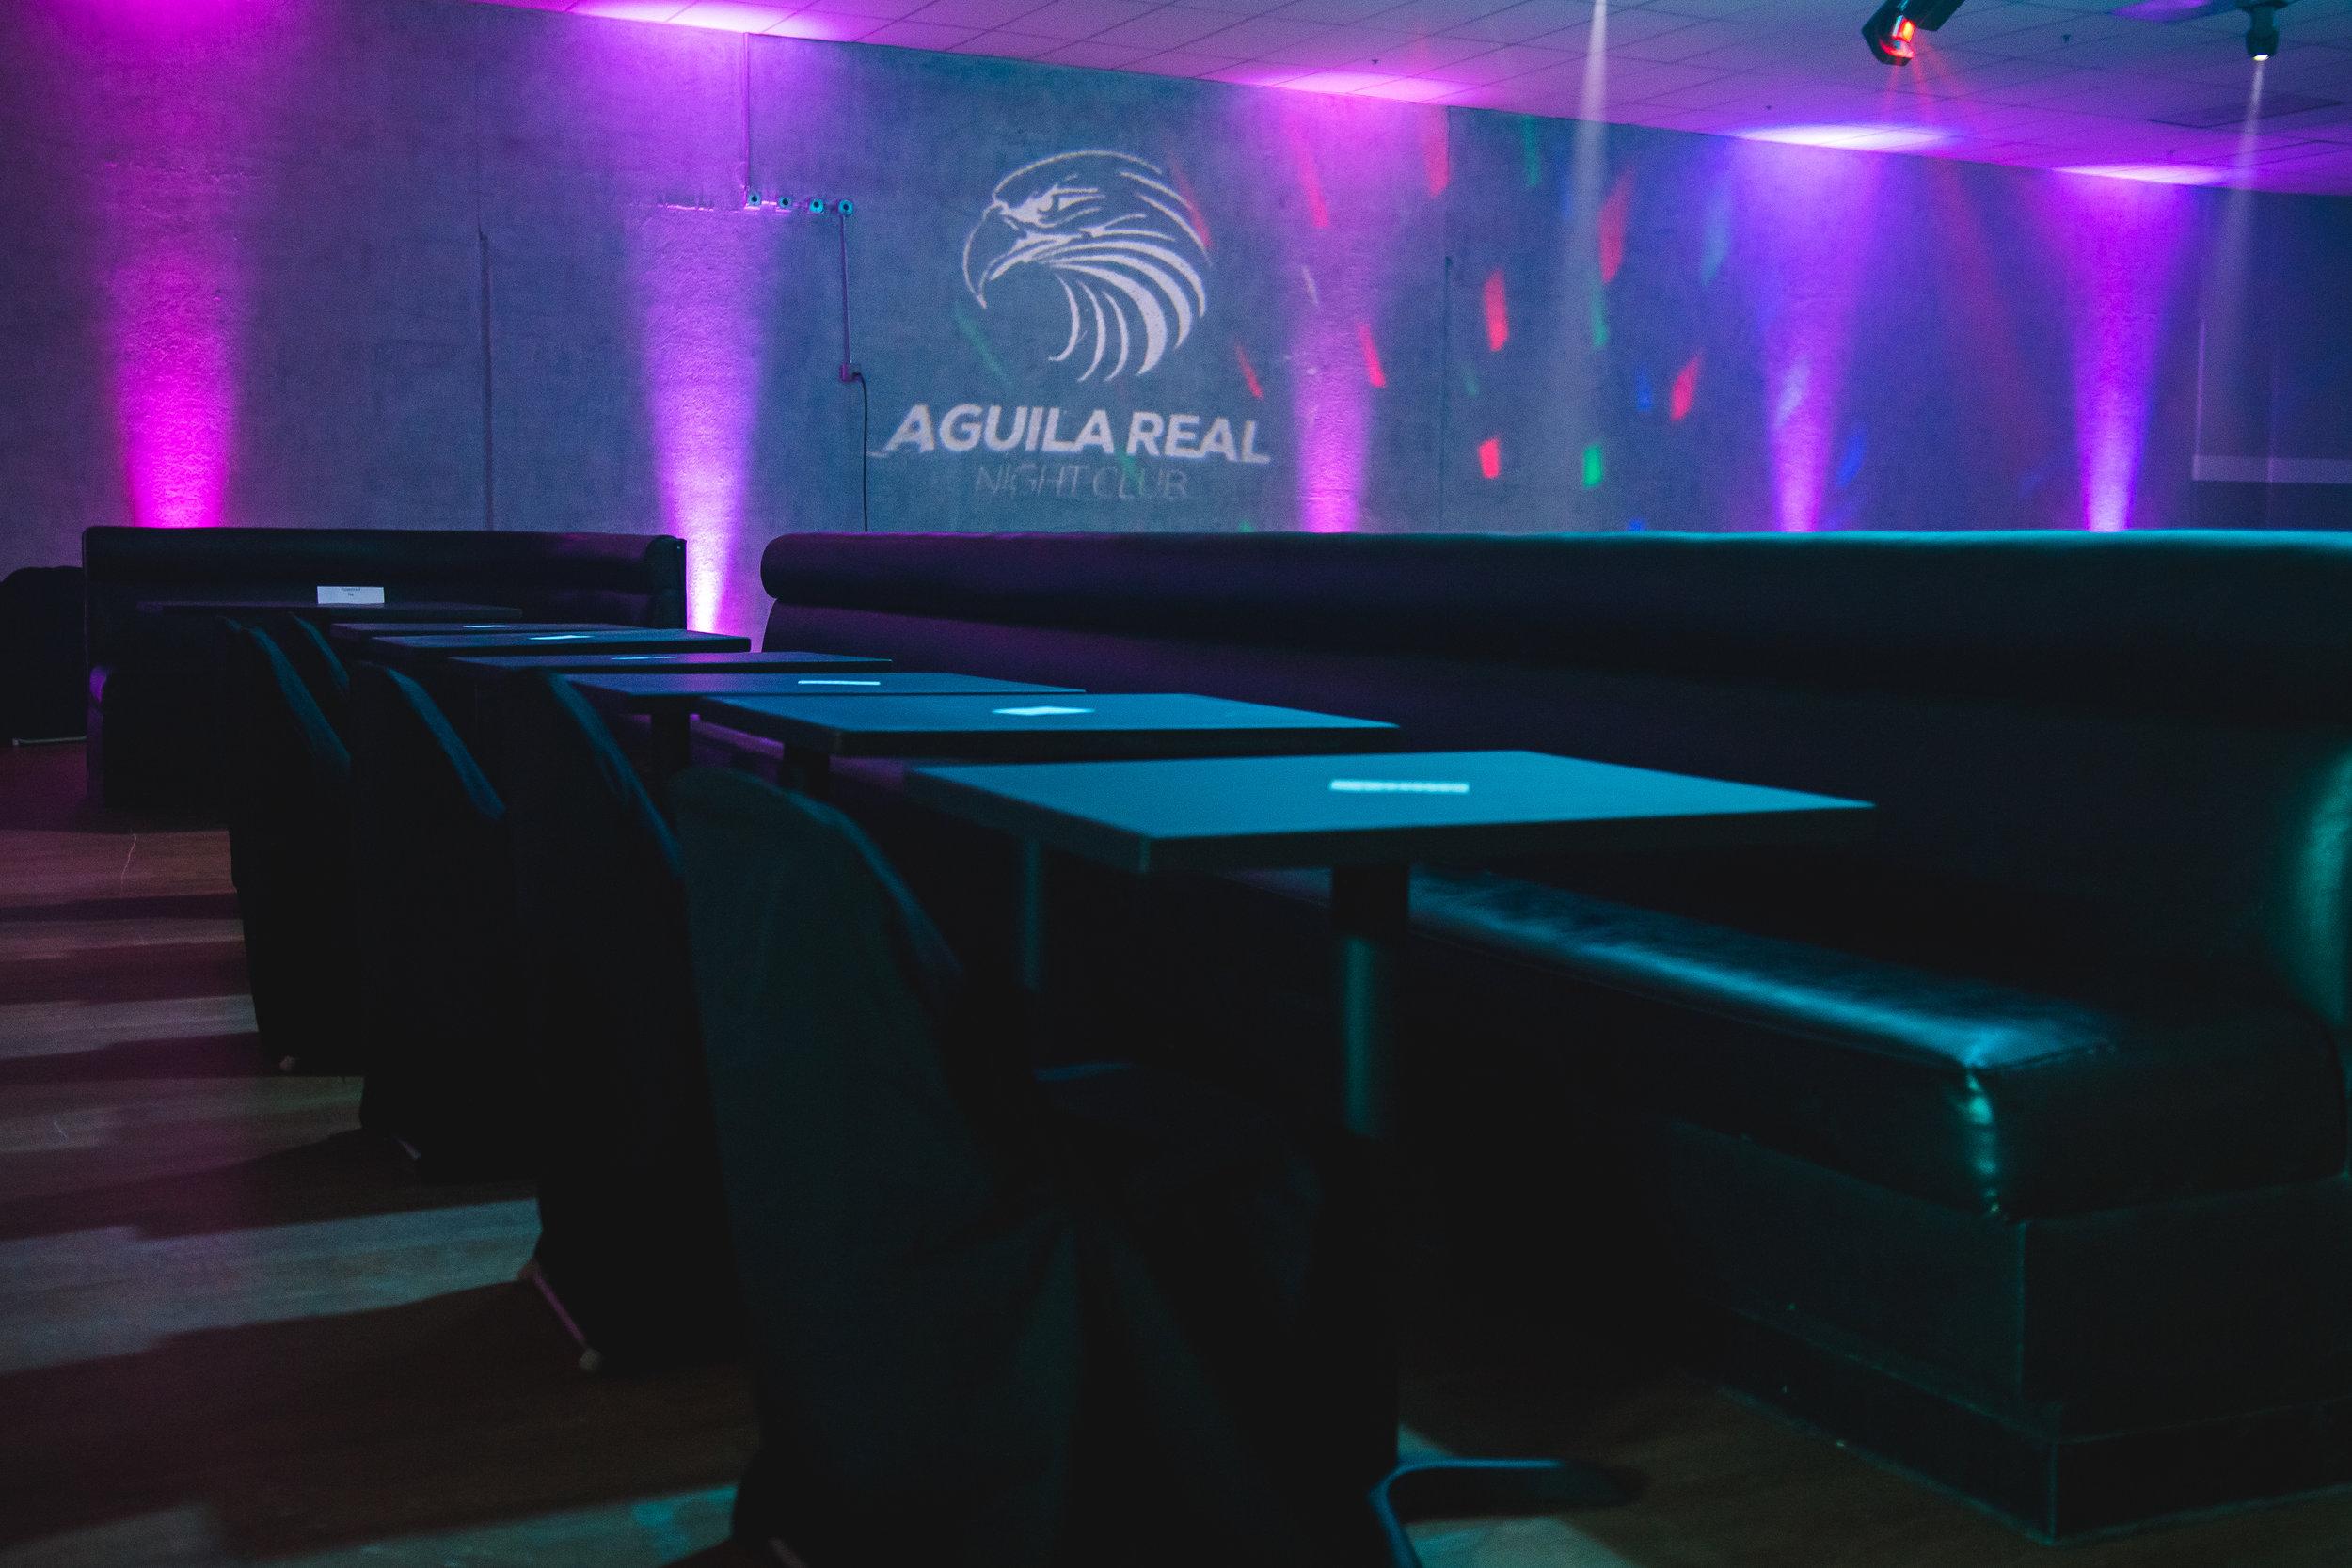 10-3-16 Aguila Real Night Club - IMG_7757.jpg